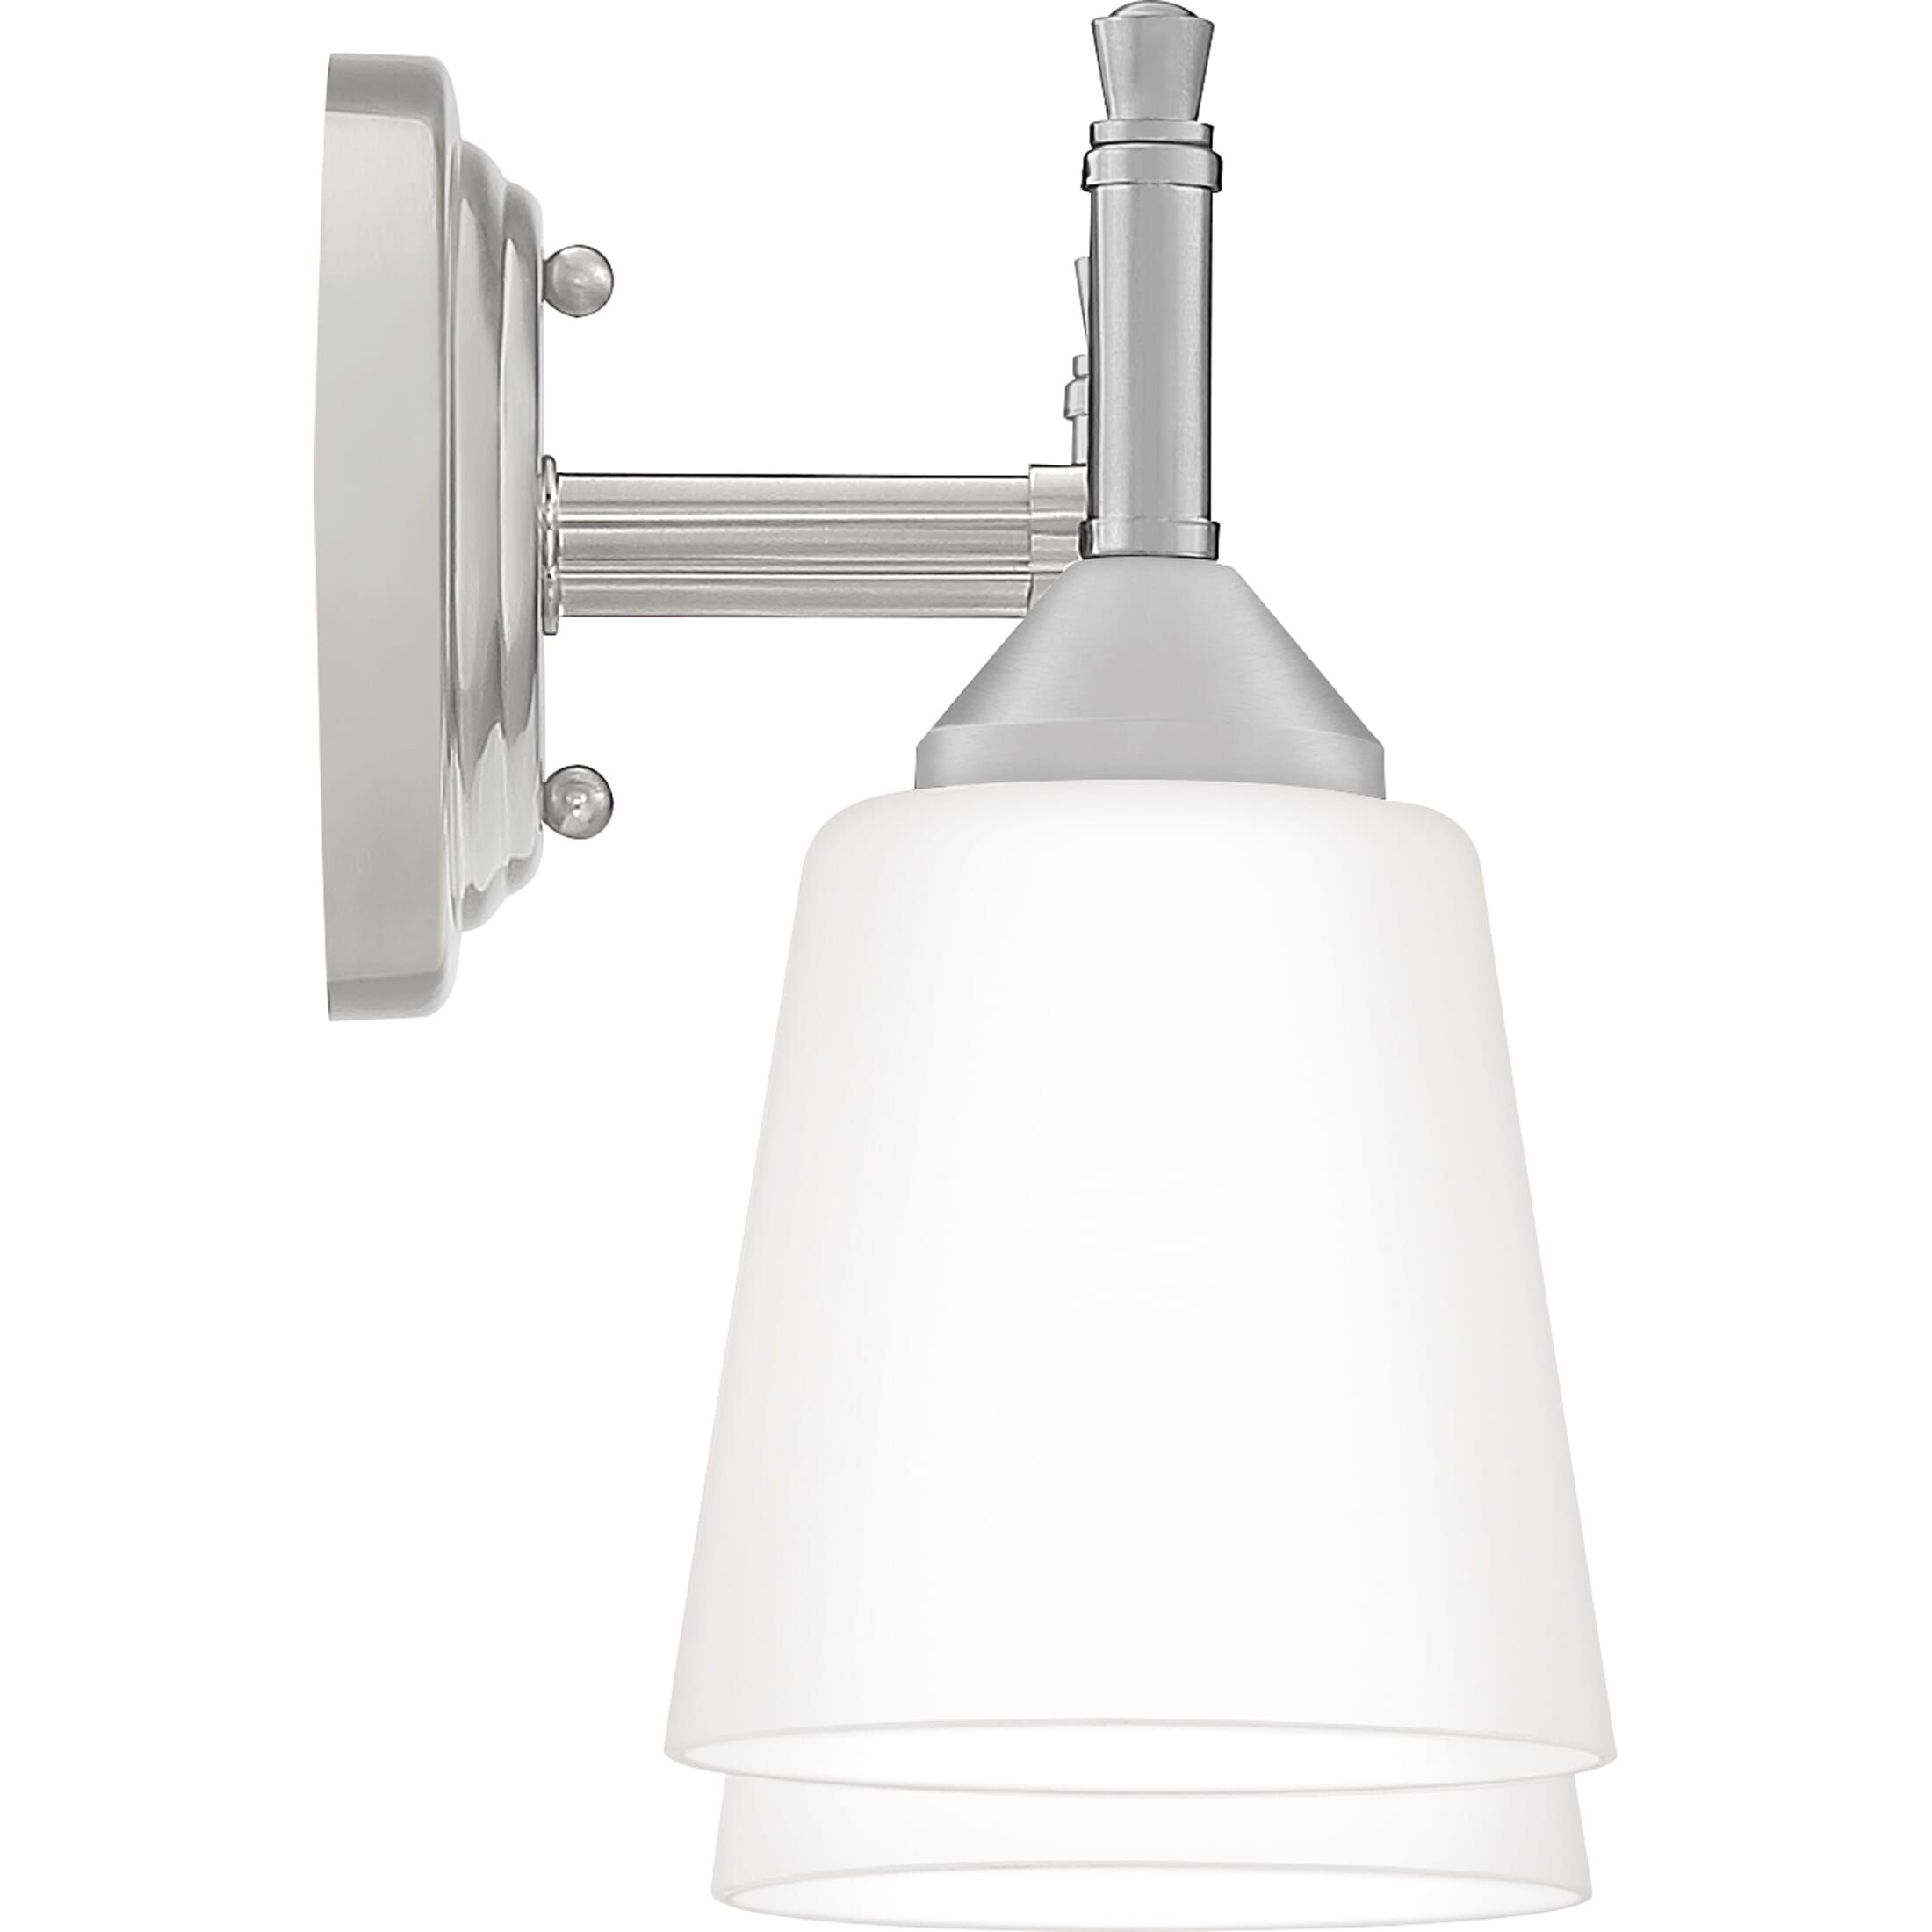 "Photo of Quoizel Billingsley 2-Light 14 ""washstand lamp made of brushed nickel"